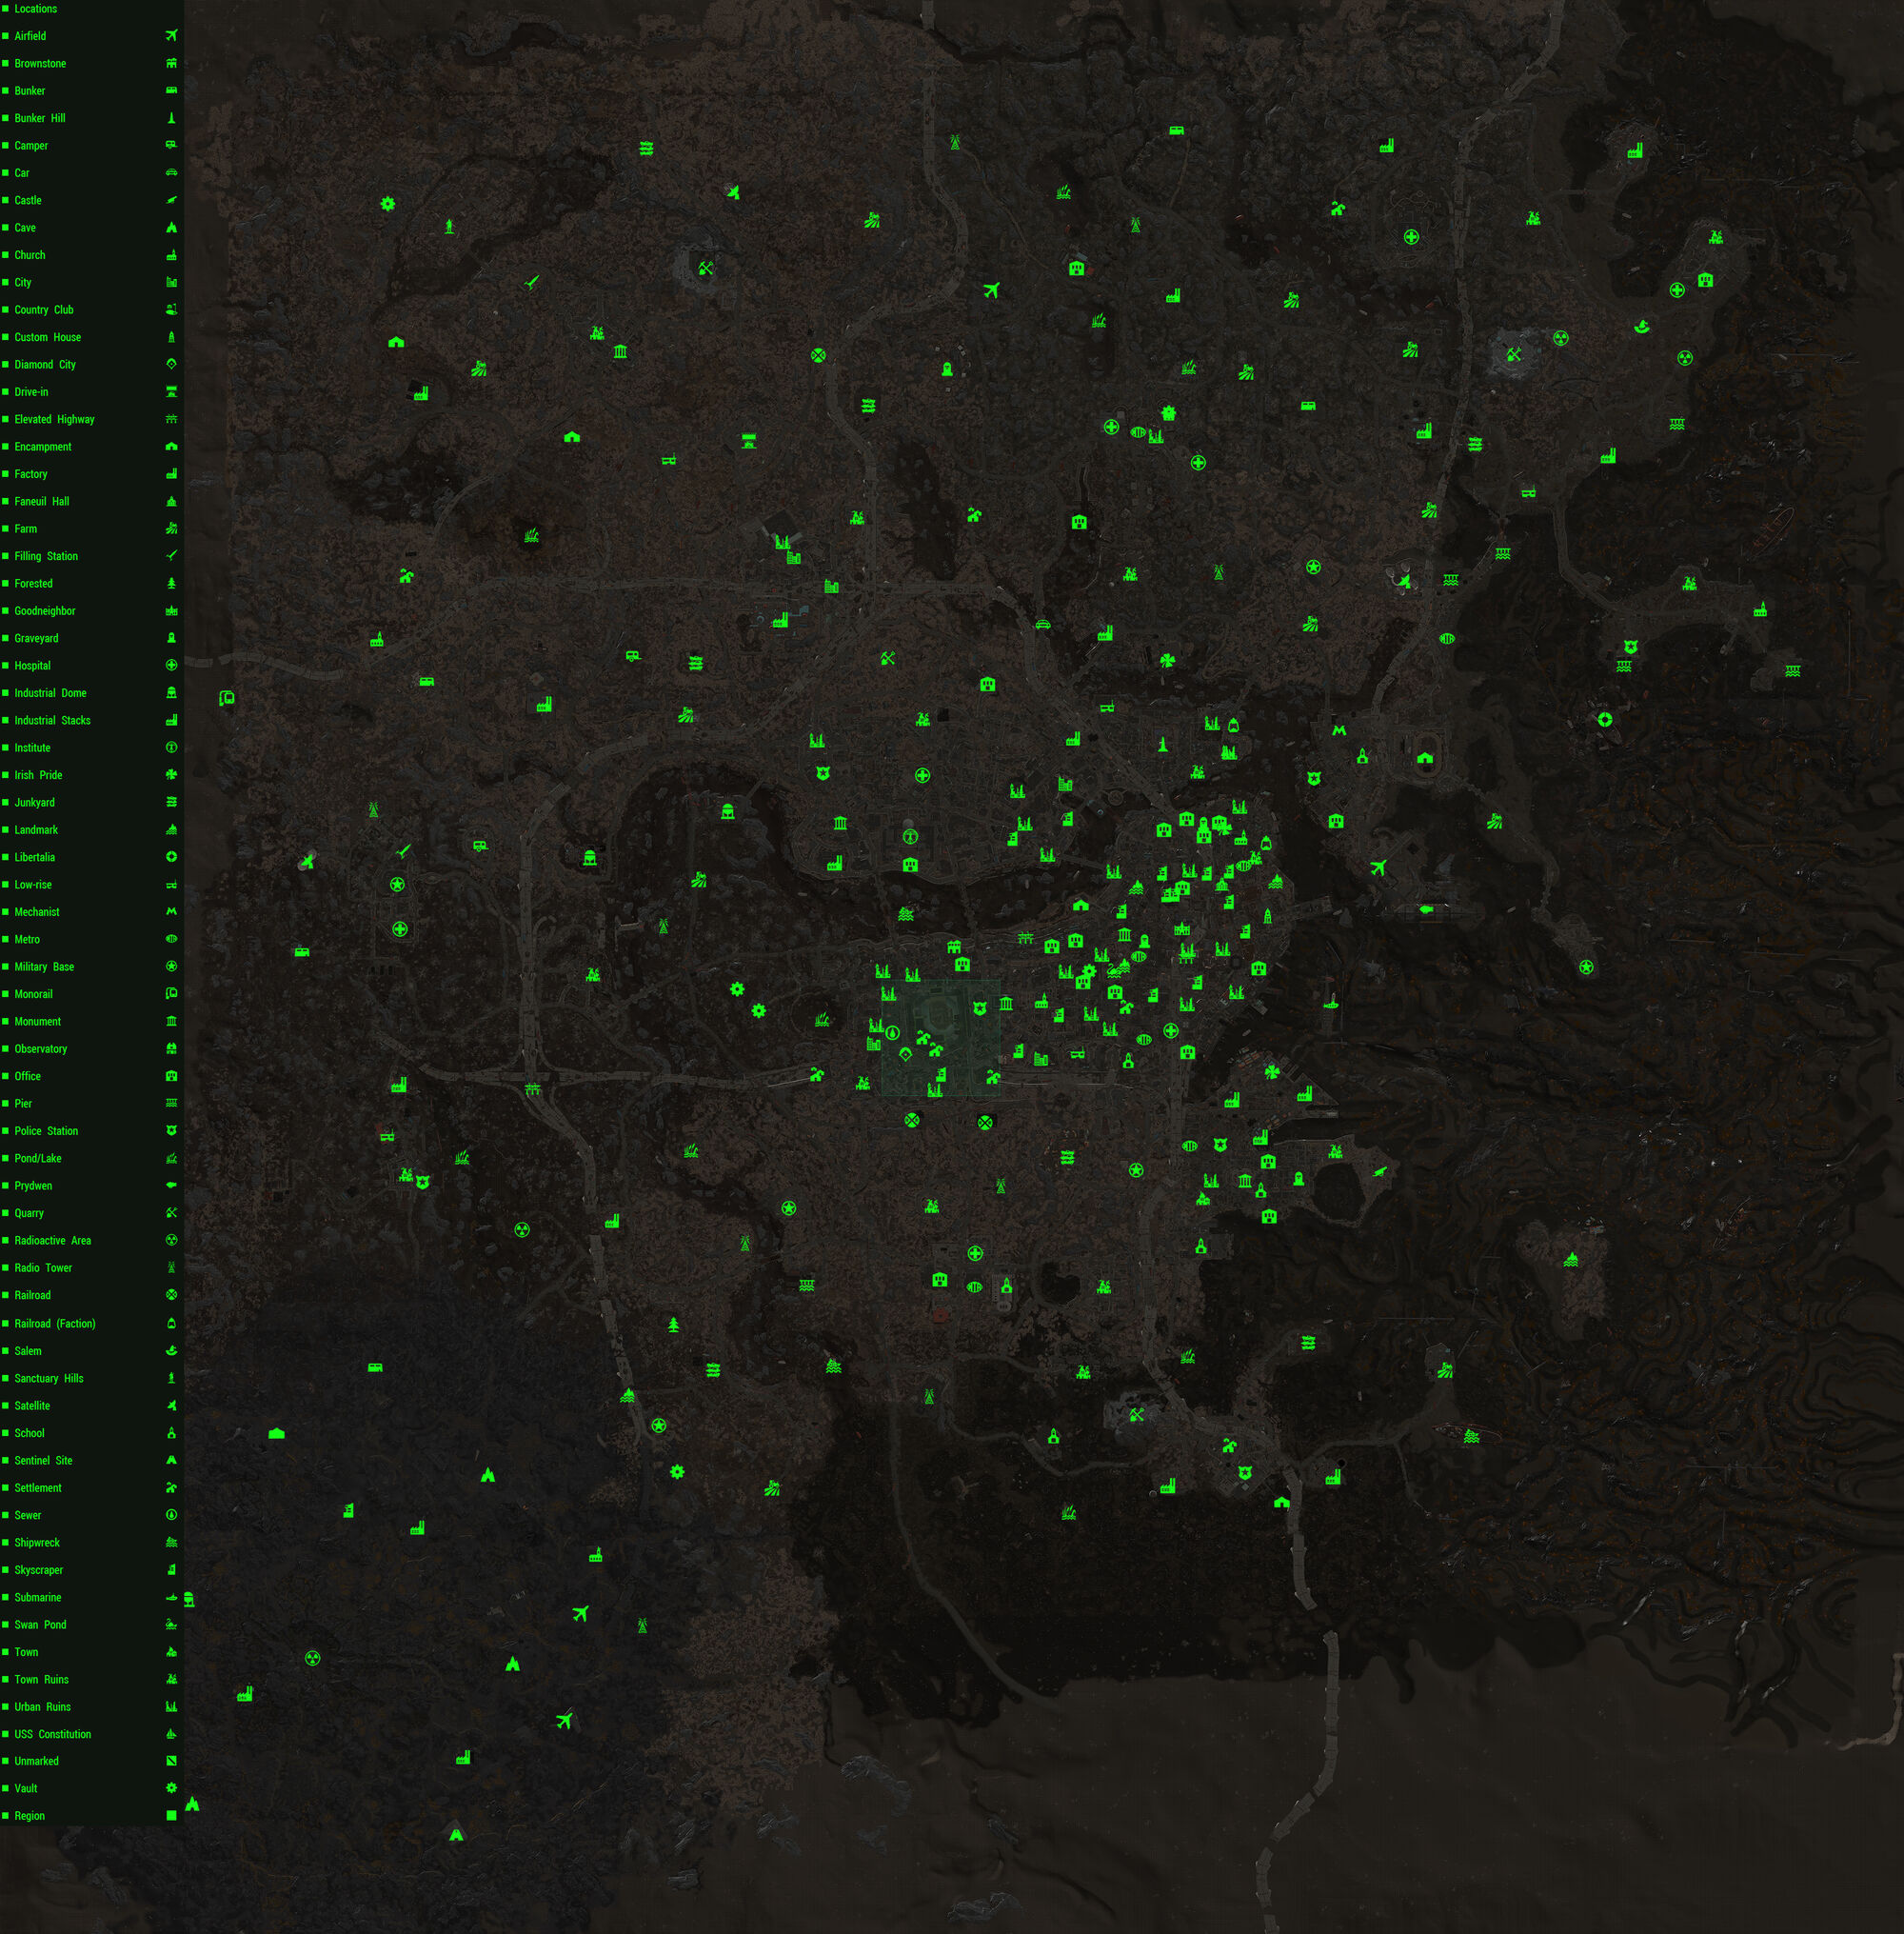 Fallout 4 map | Fallout Wiki | FANDOM powered by Wikia